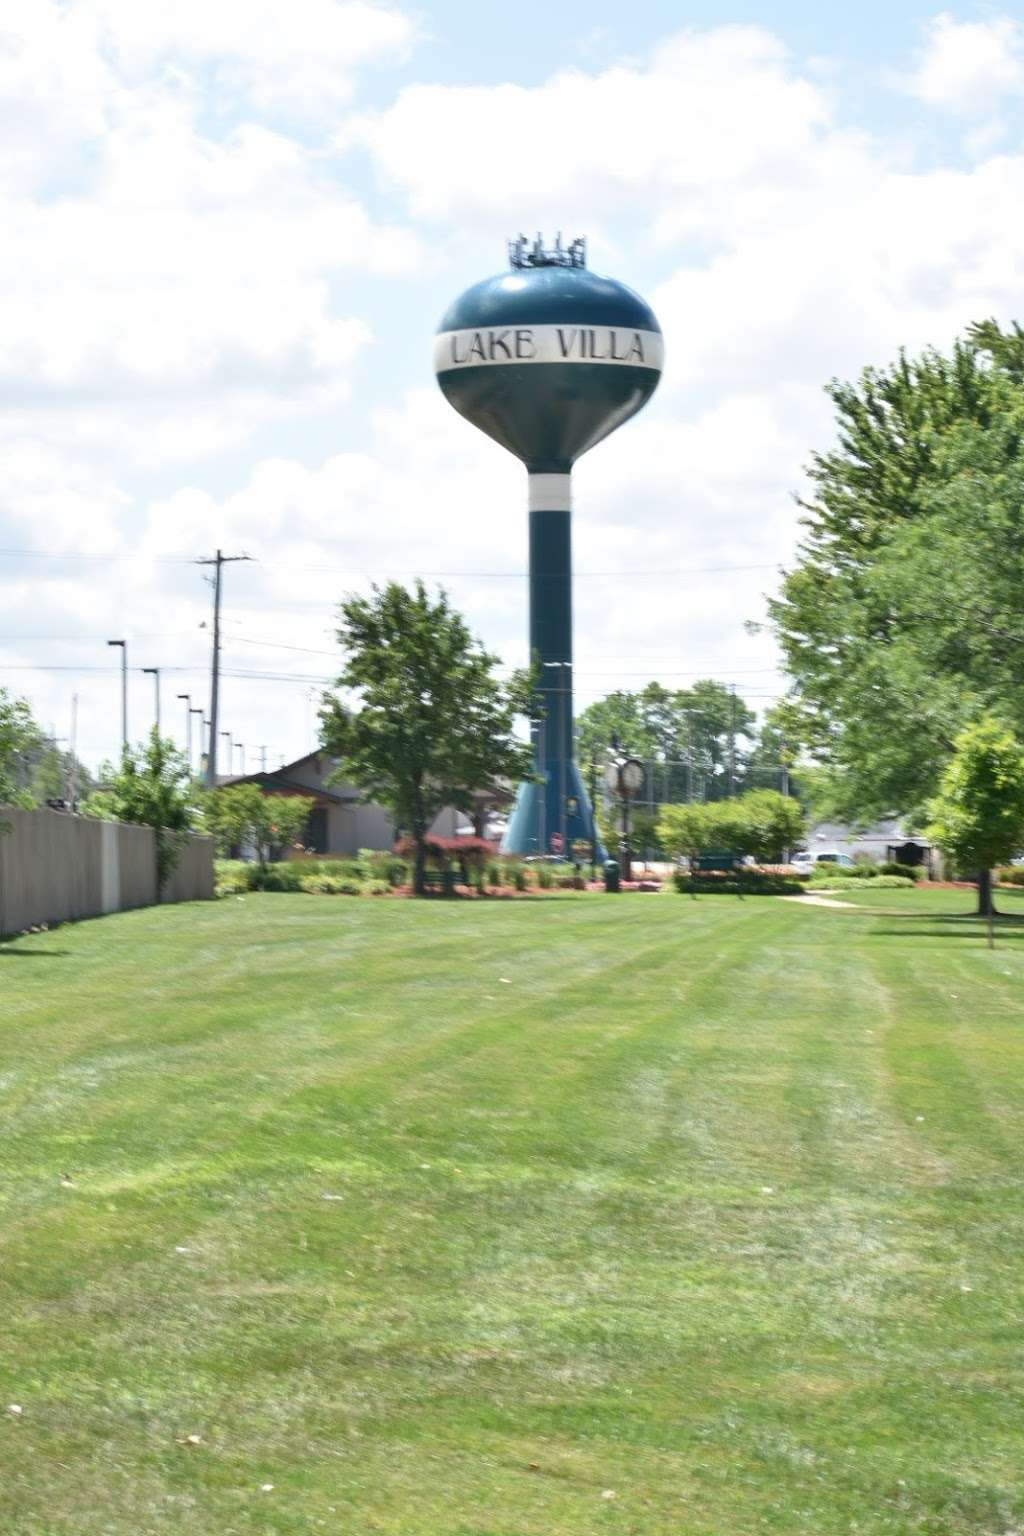 Lehmann Park - park  | Photo 6 of 10 | Address: 89 Cedar Ave, Lake Villa, IL 60046, USA | Phone: (847) 356-6100